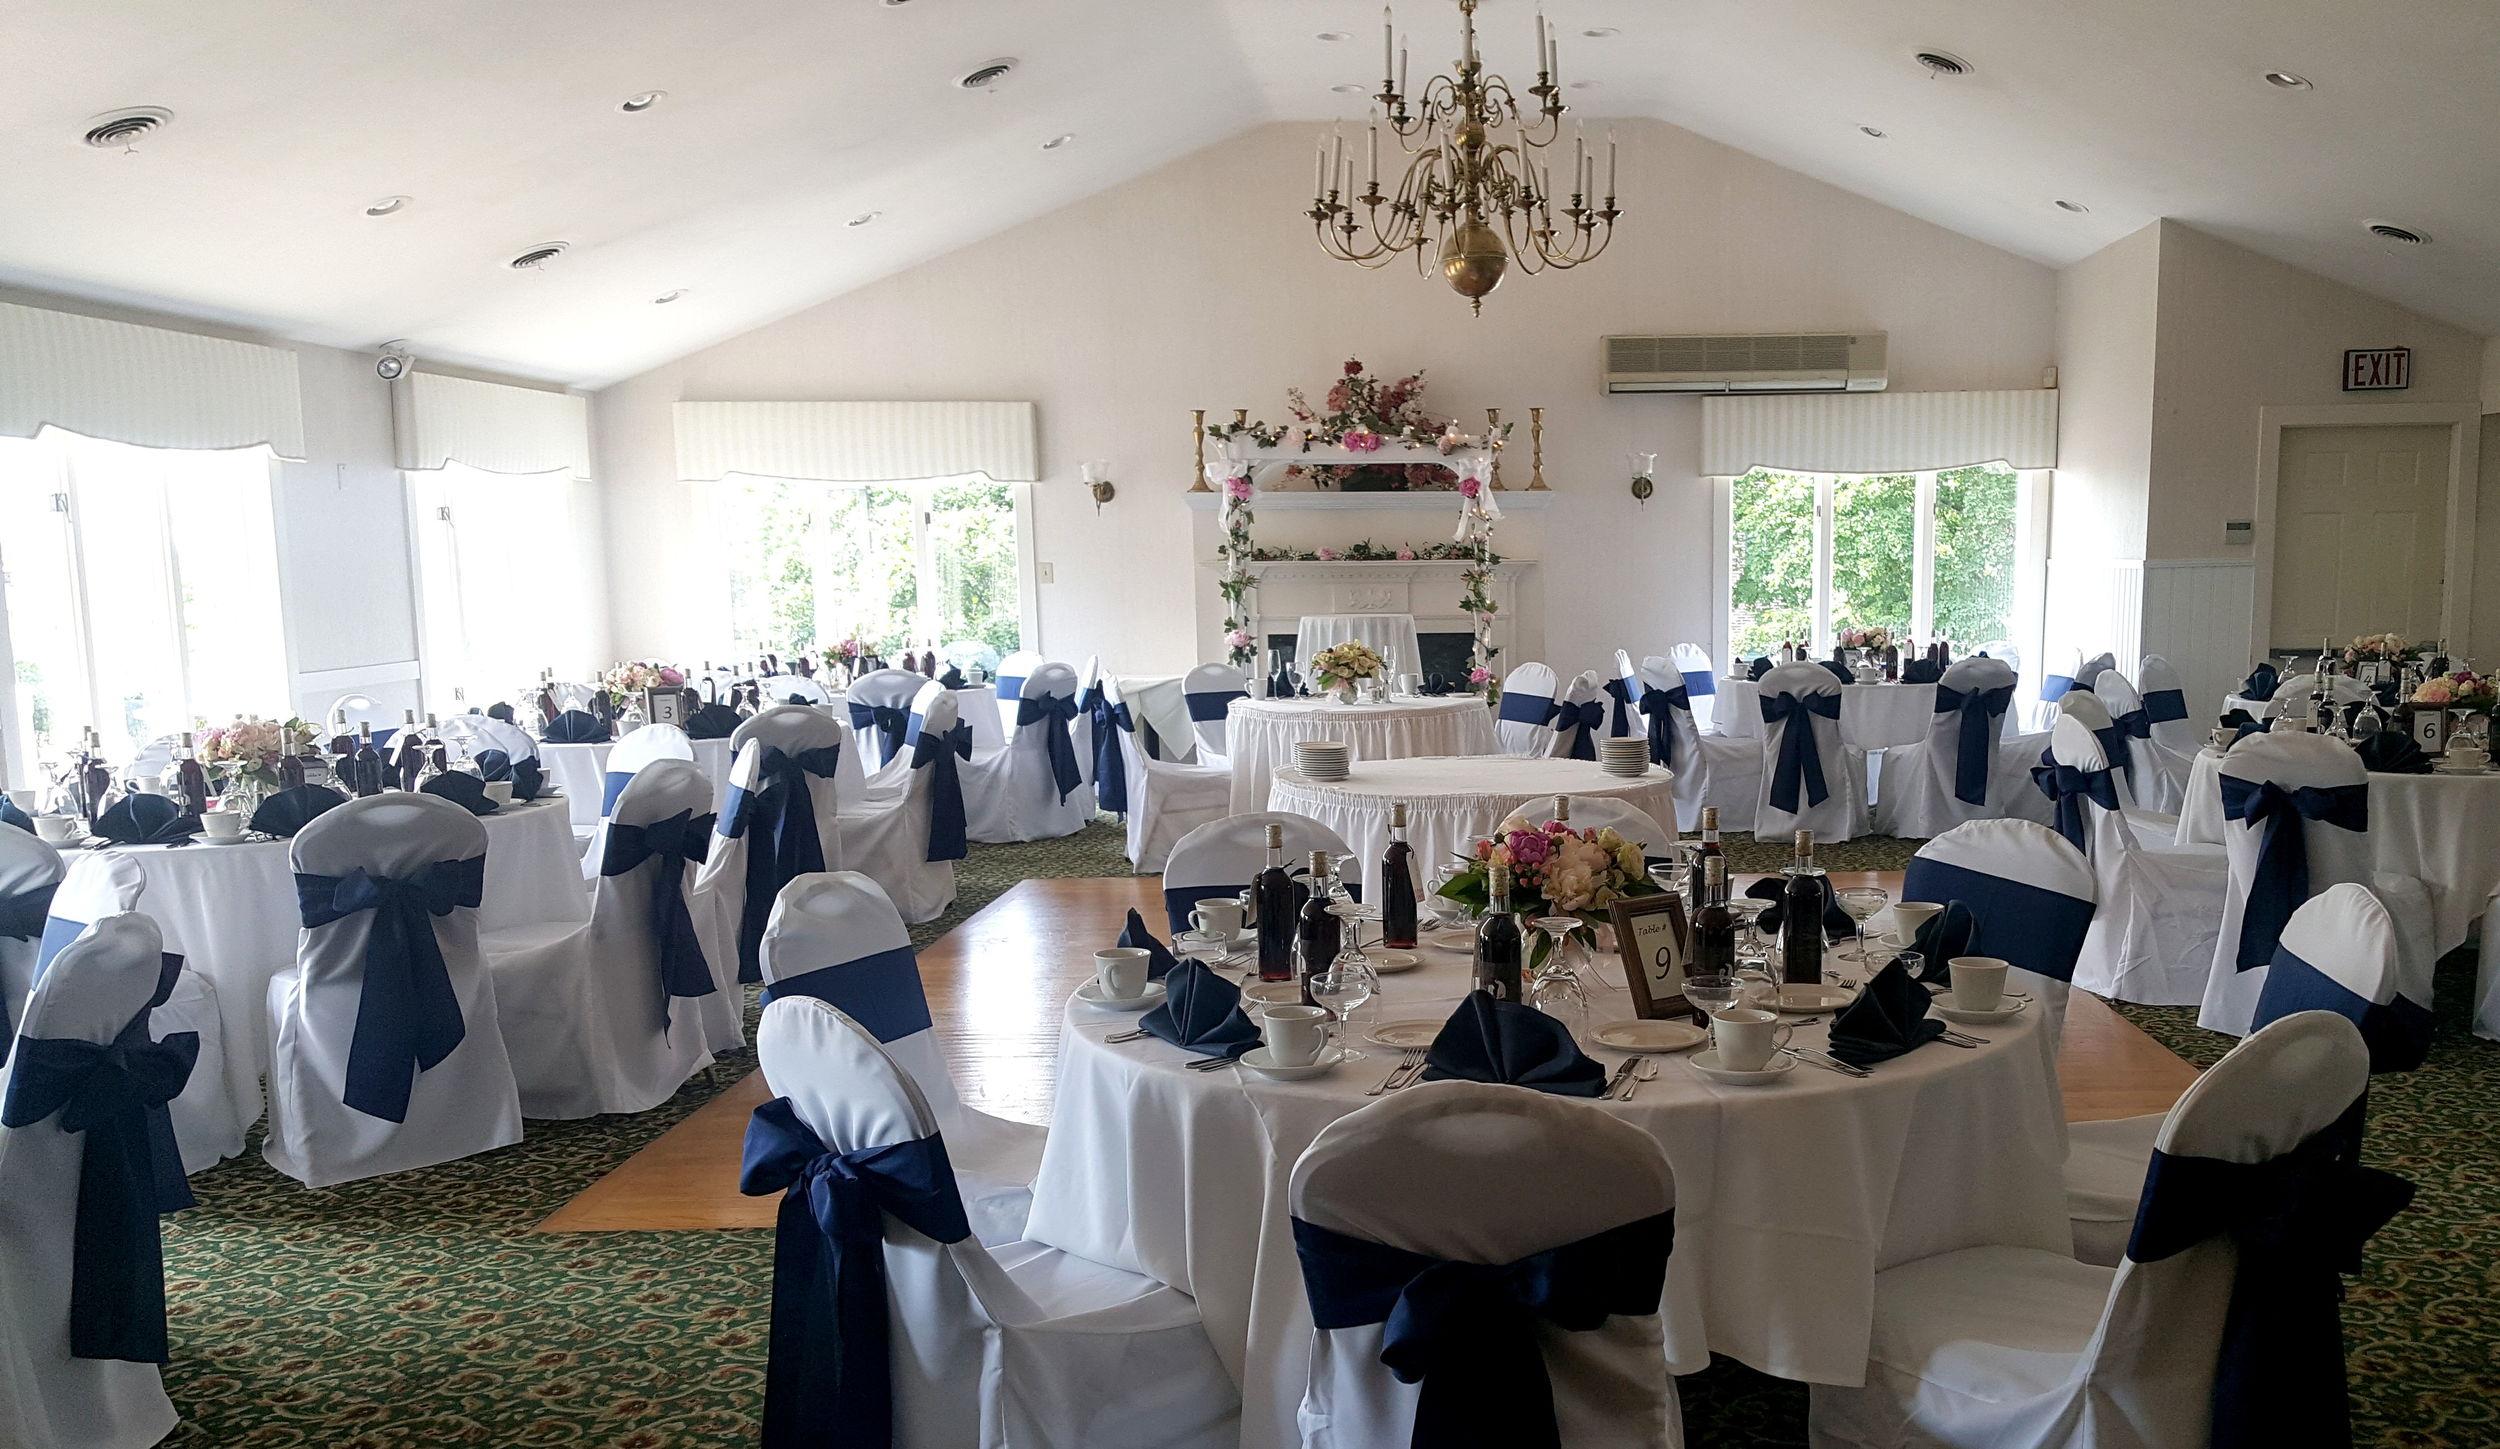 bayponyinnbanquetroomweddings.jpg